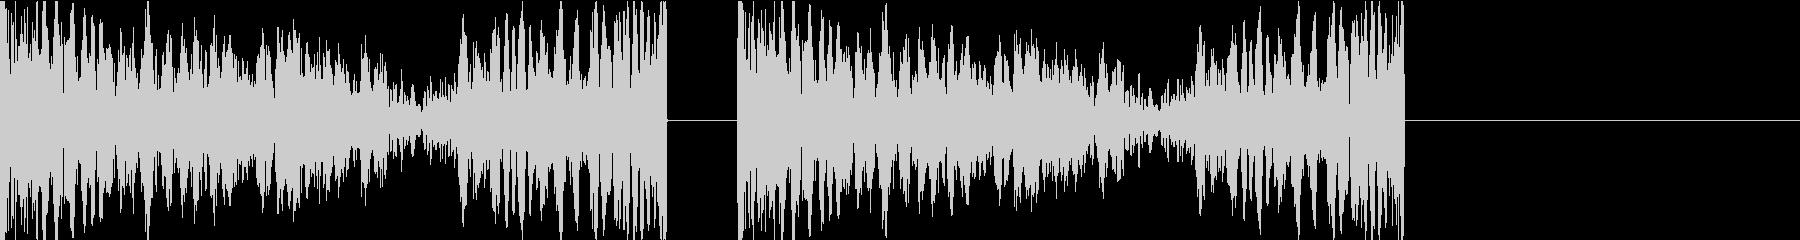 DJプレイ スクラッチ・ノイズ 266の未再生の波形